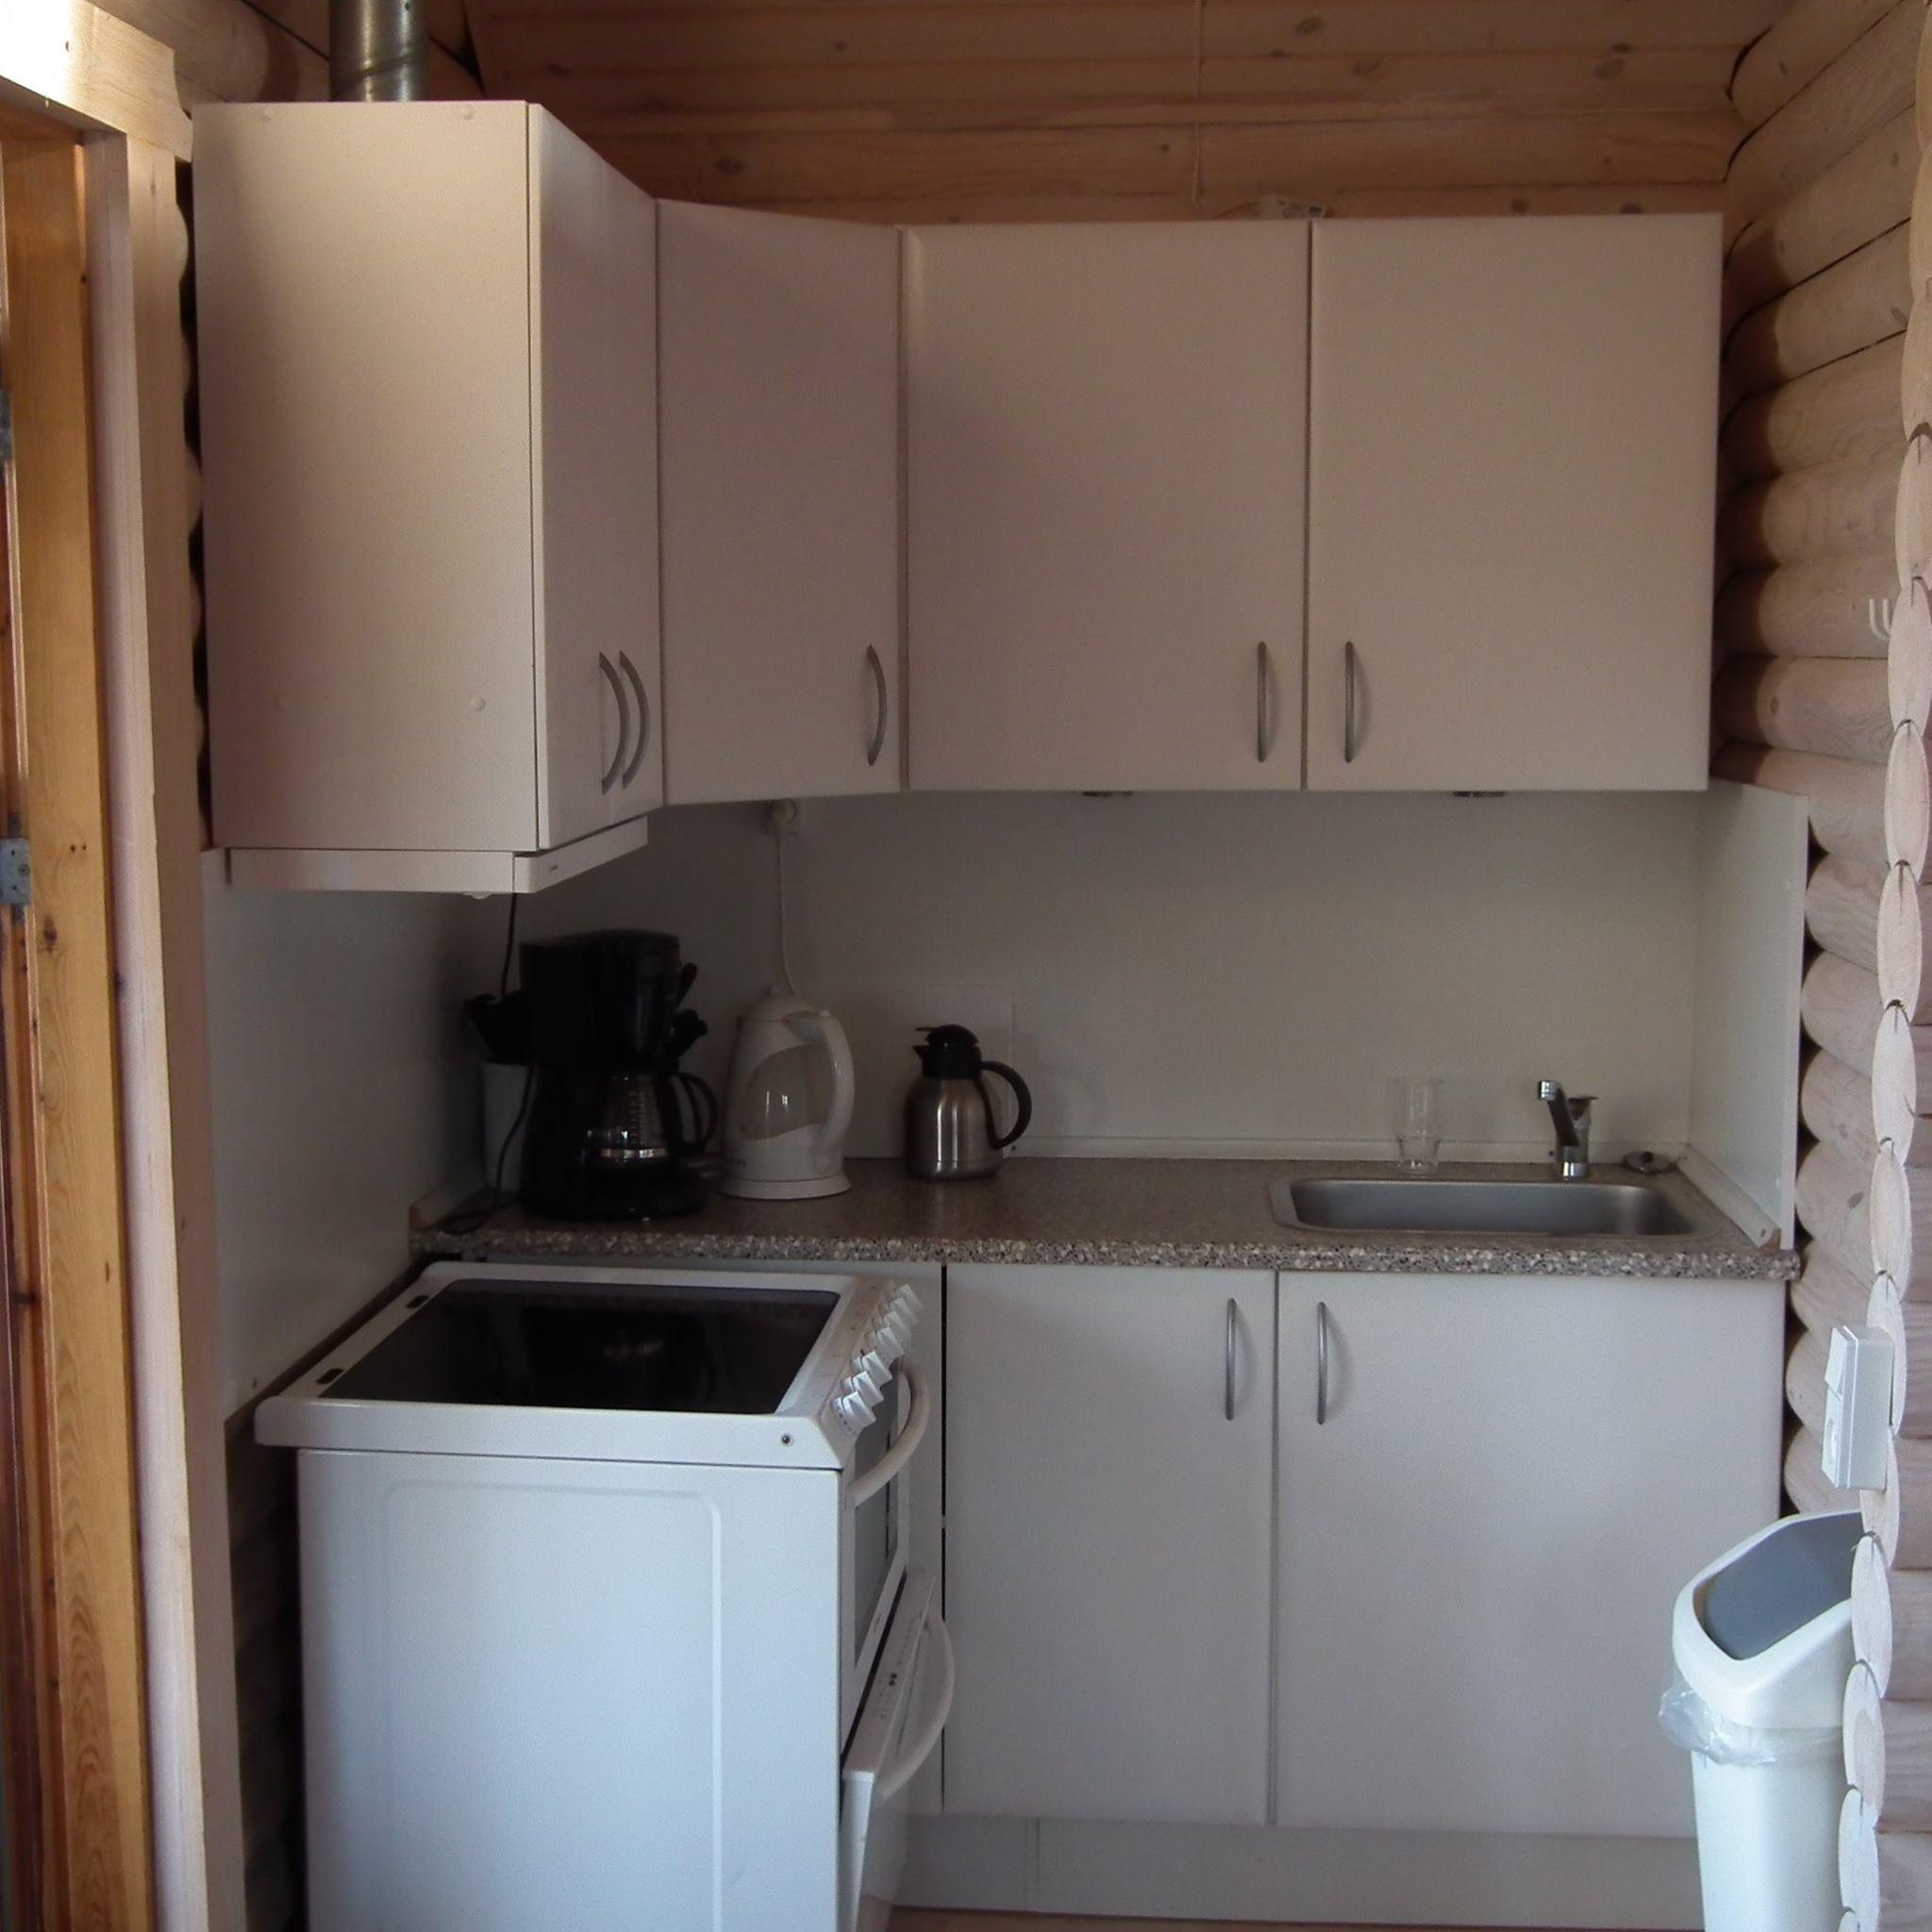 Luksus campinghytter i Sønderjylland | Book en feriehytte her →